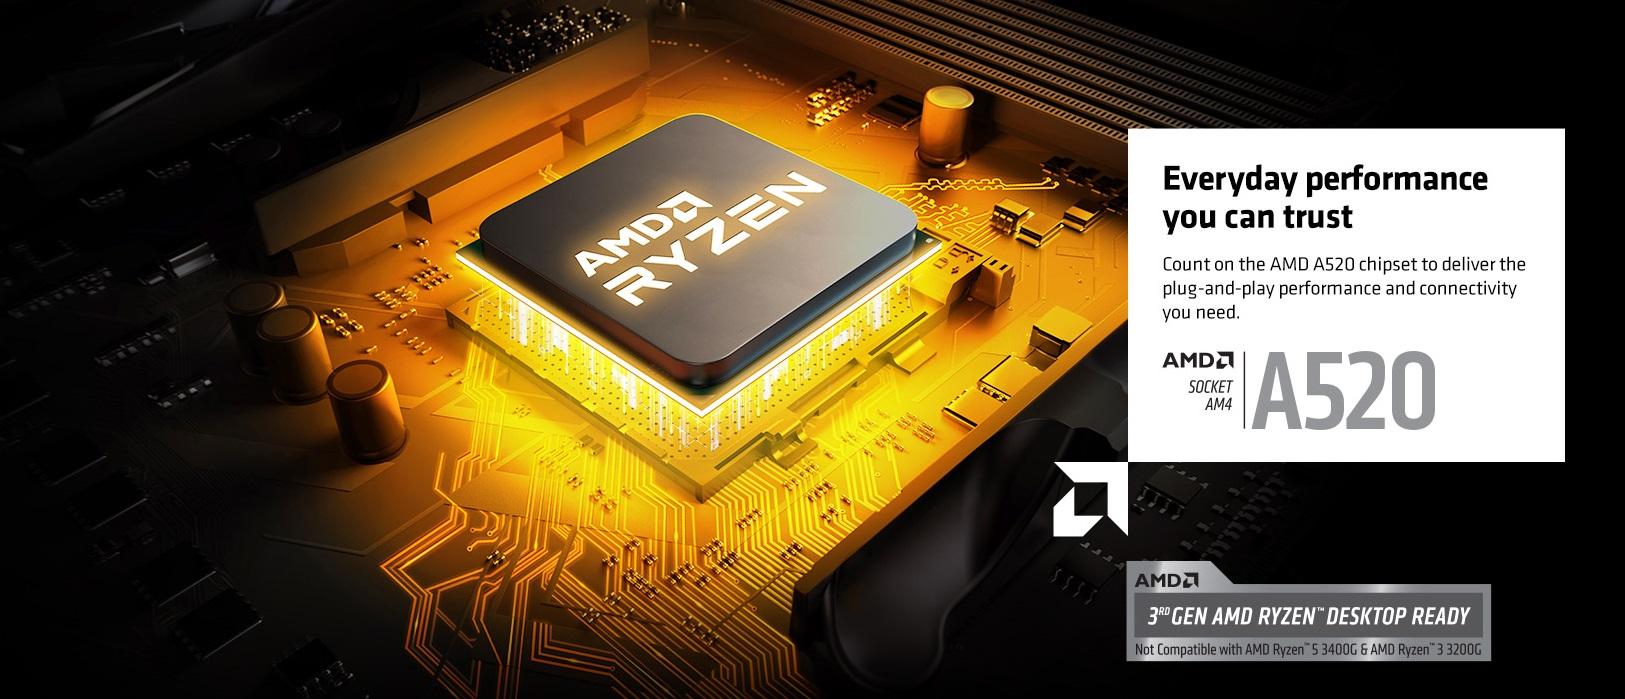 AMD Meluncurkan Entry-Level A520 Motherboards Untuk Next-Gen Ryzen CPUs & APUs